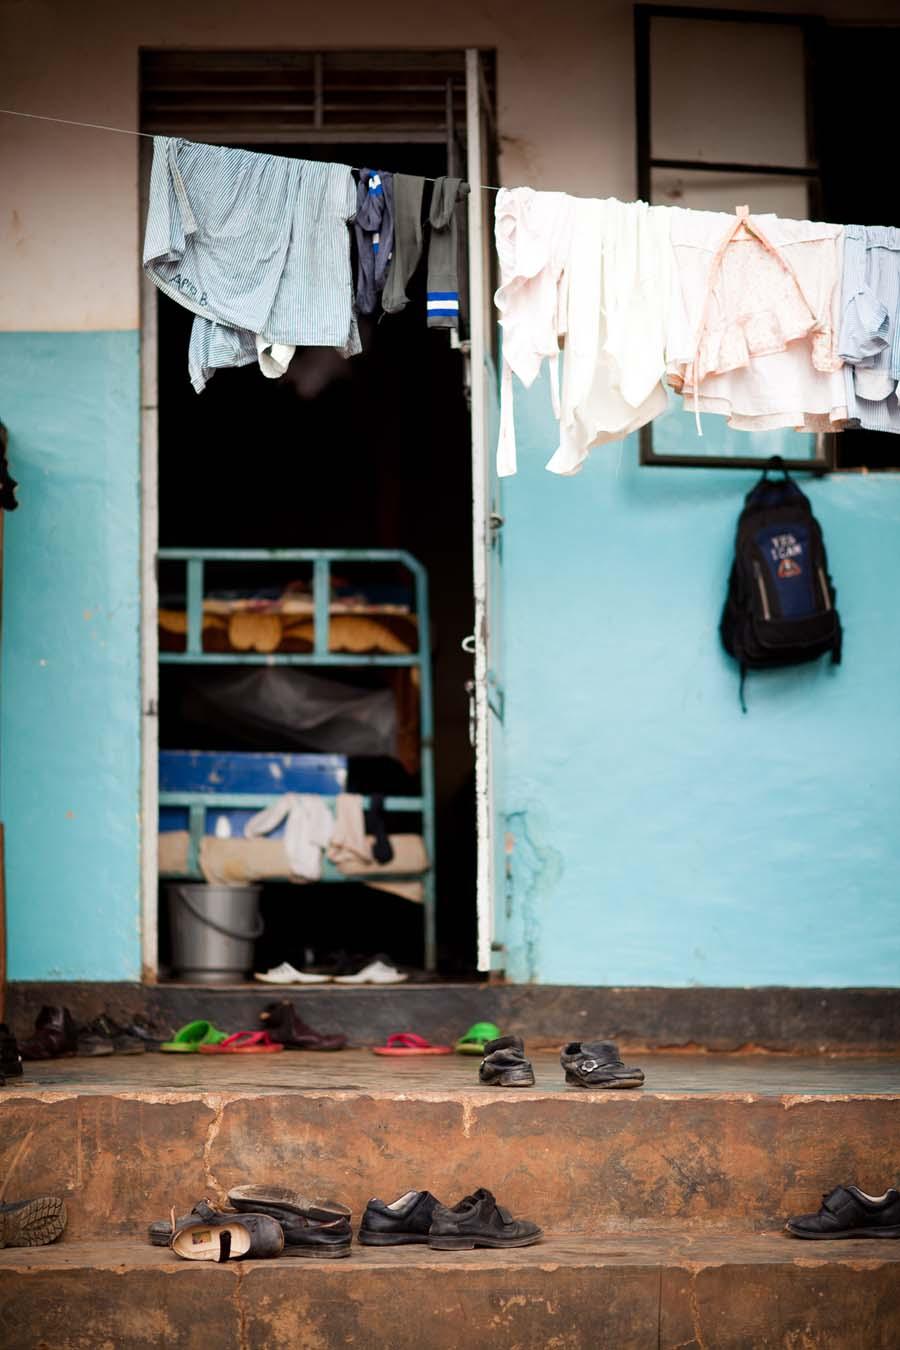 jessicadavisphotography.com | Jessica Davis Photography | Portrait Work in Uganda| Travel Photographer | World Event Photographs 5 (7).jpg